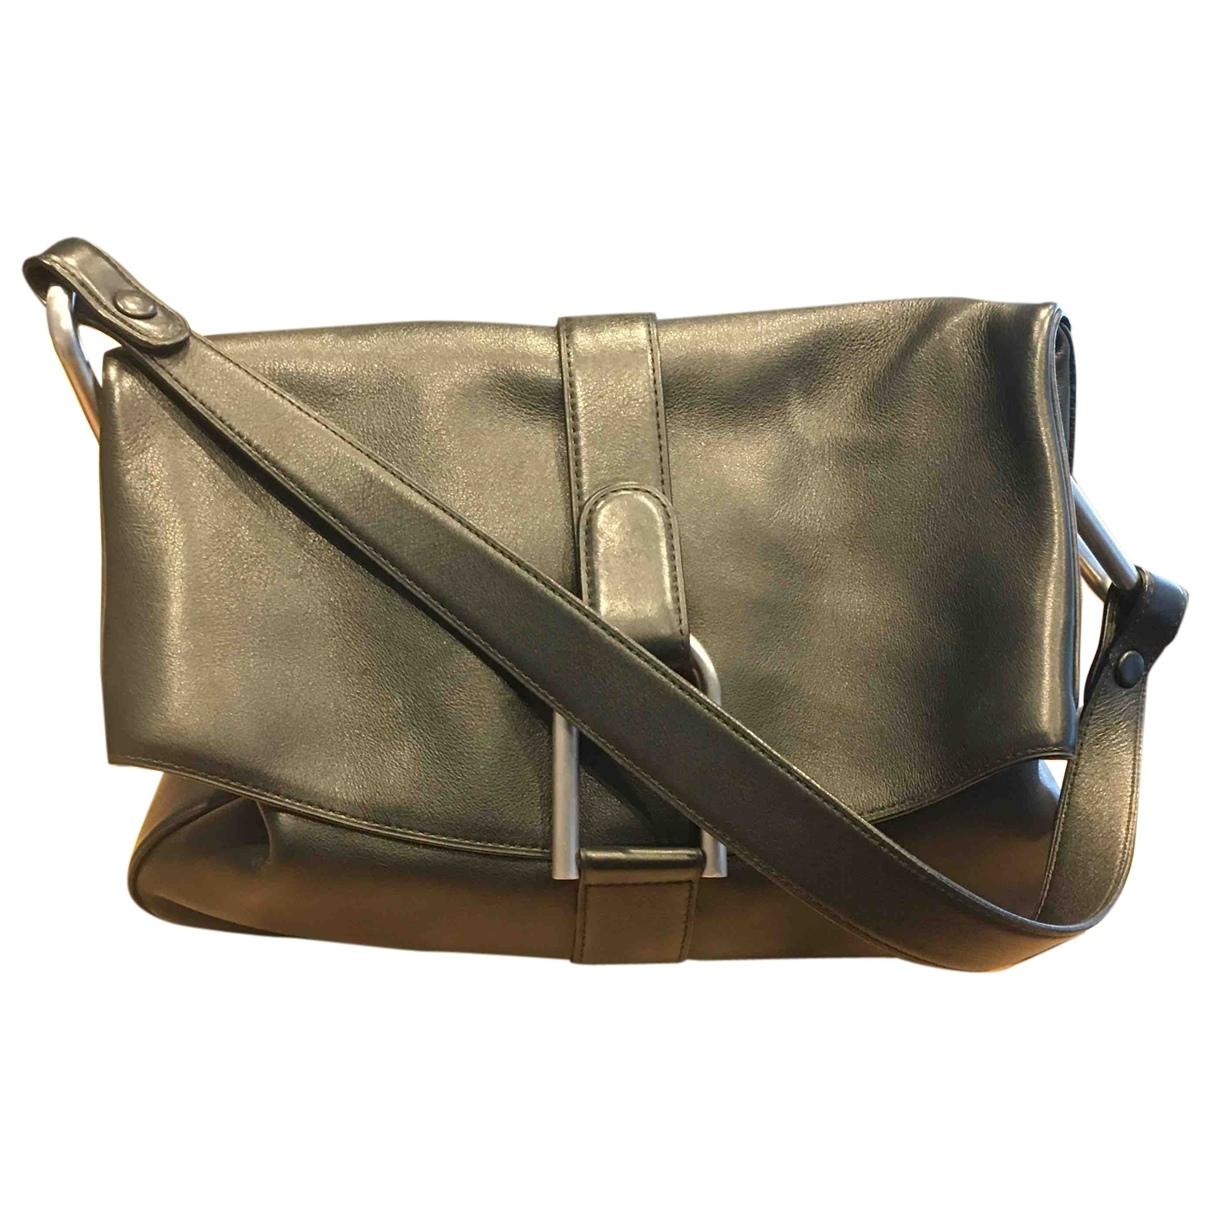 Delvaux \N Black Leather handbag for Women \N